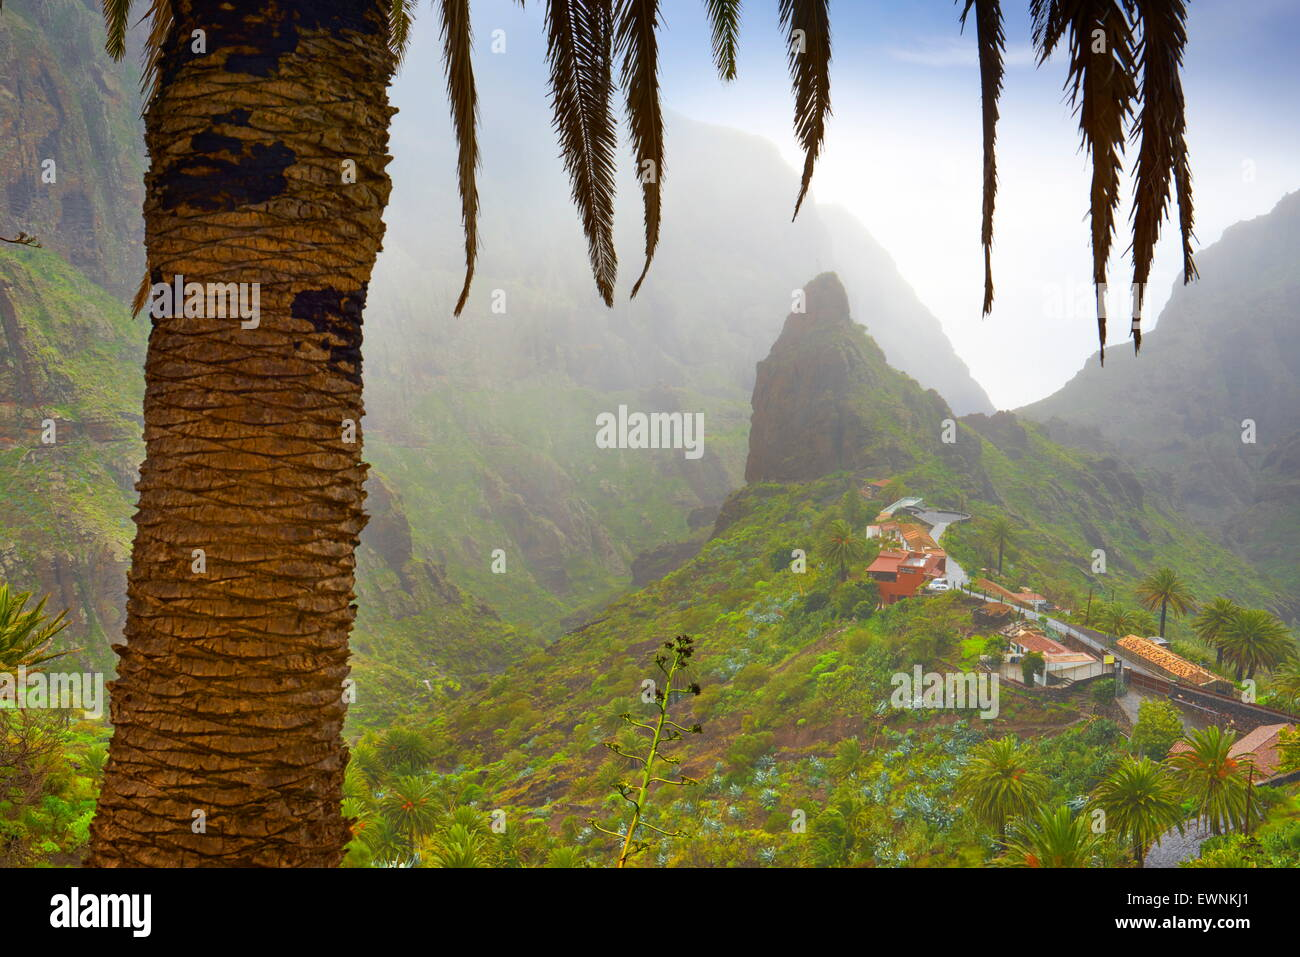 Teneriffa - Masca Dorf, Kanarische Inseln, Spanien Stockbild